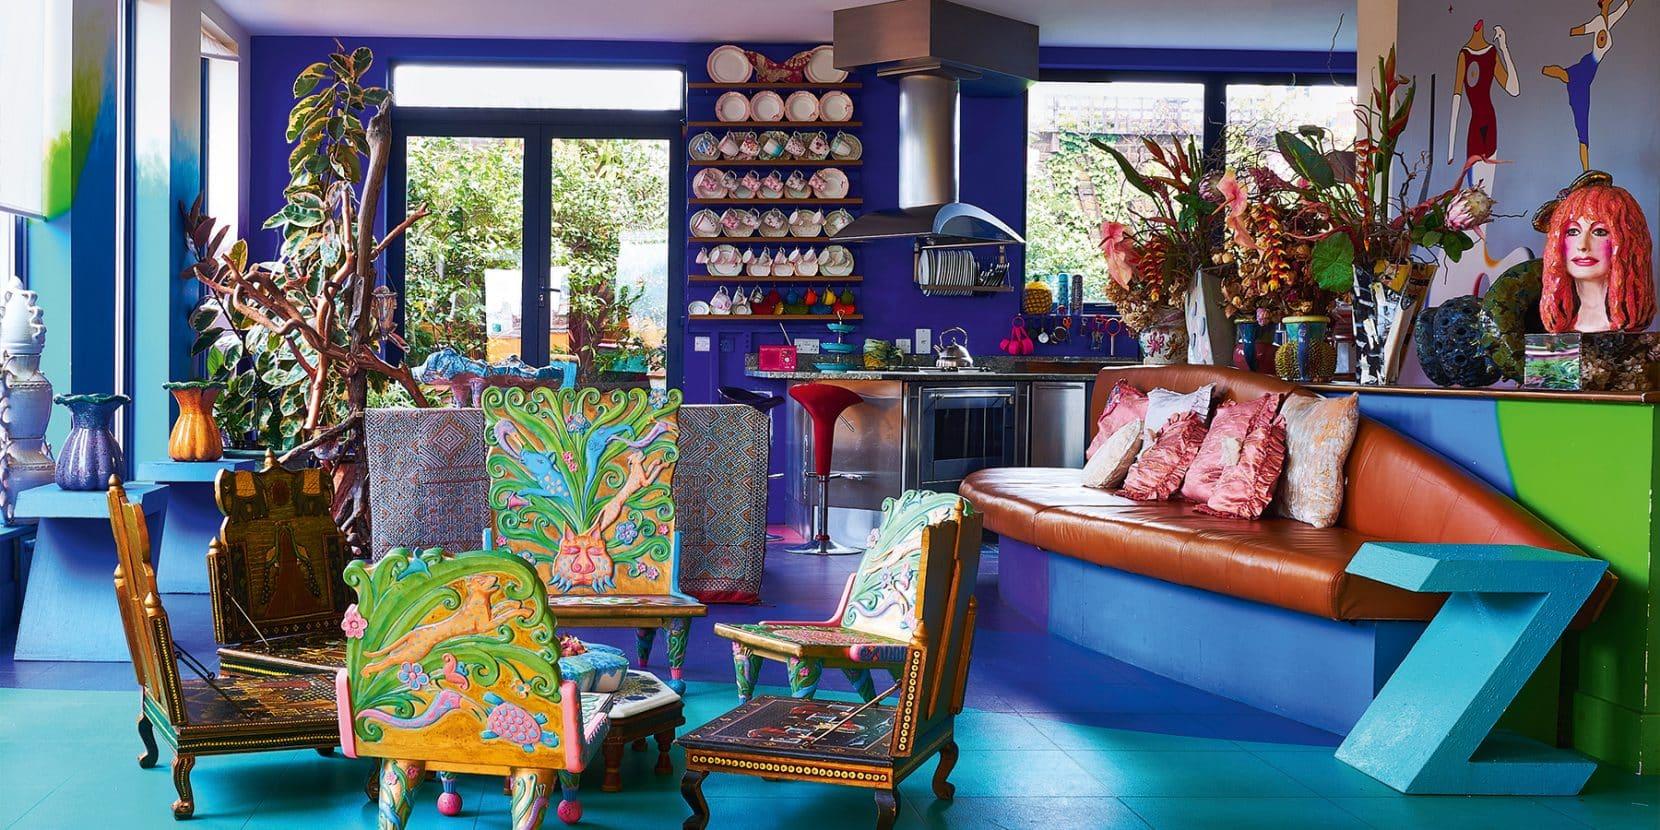 The London penthouse of fashion designer Zandra Rhodes